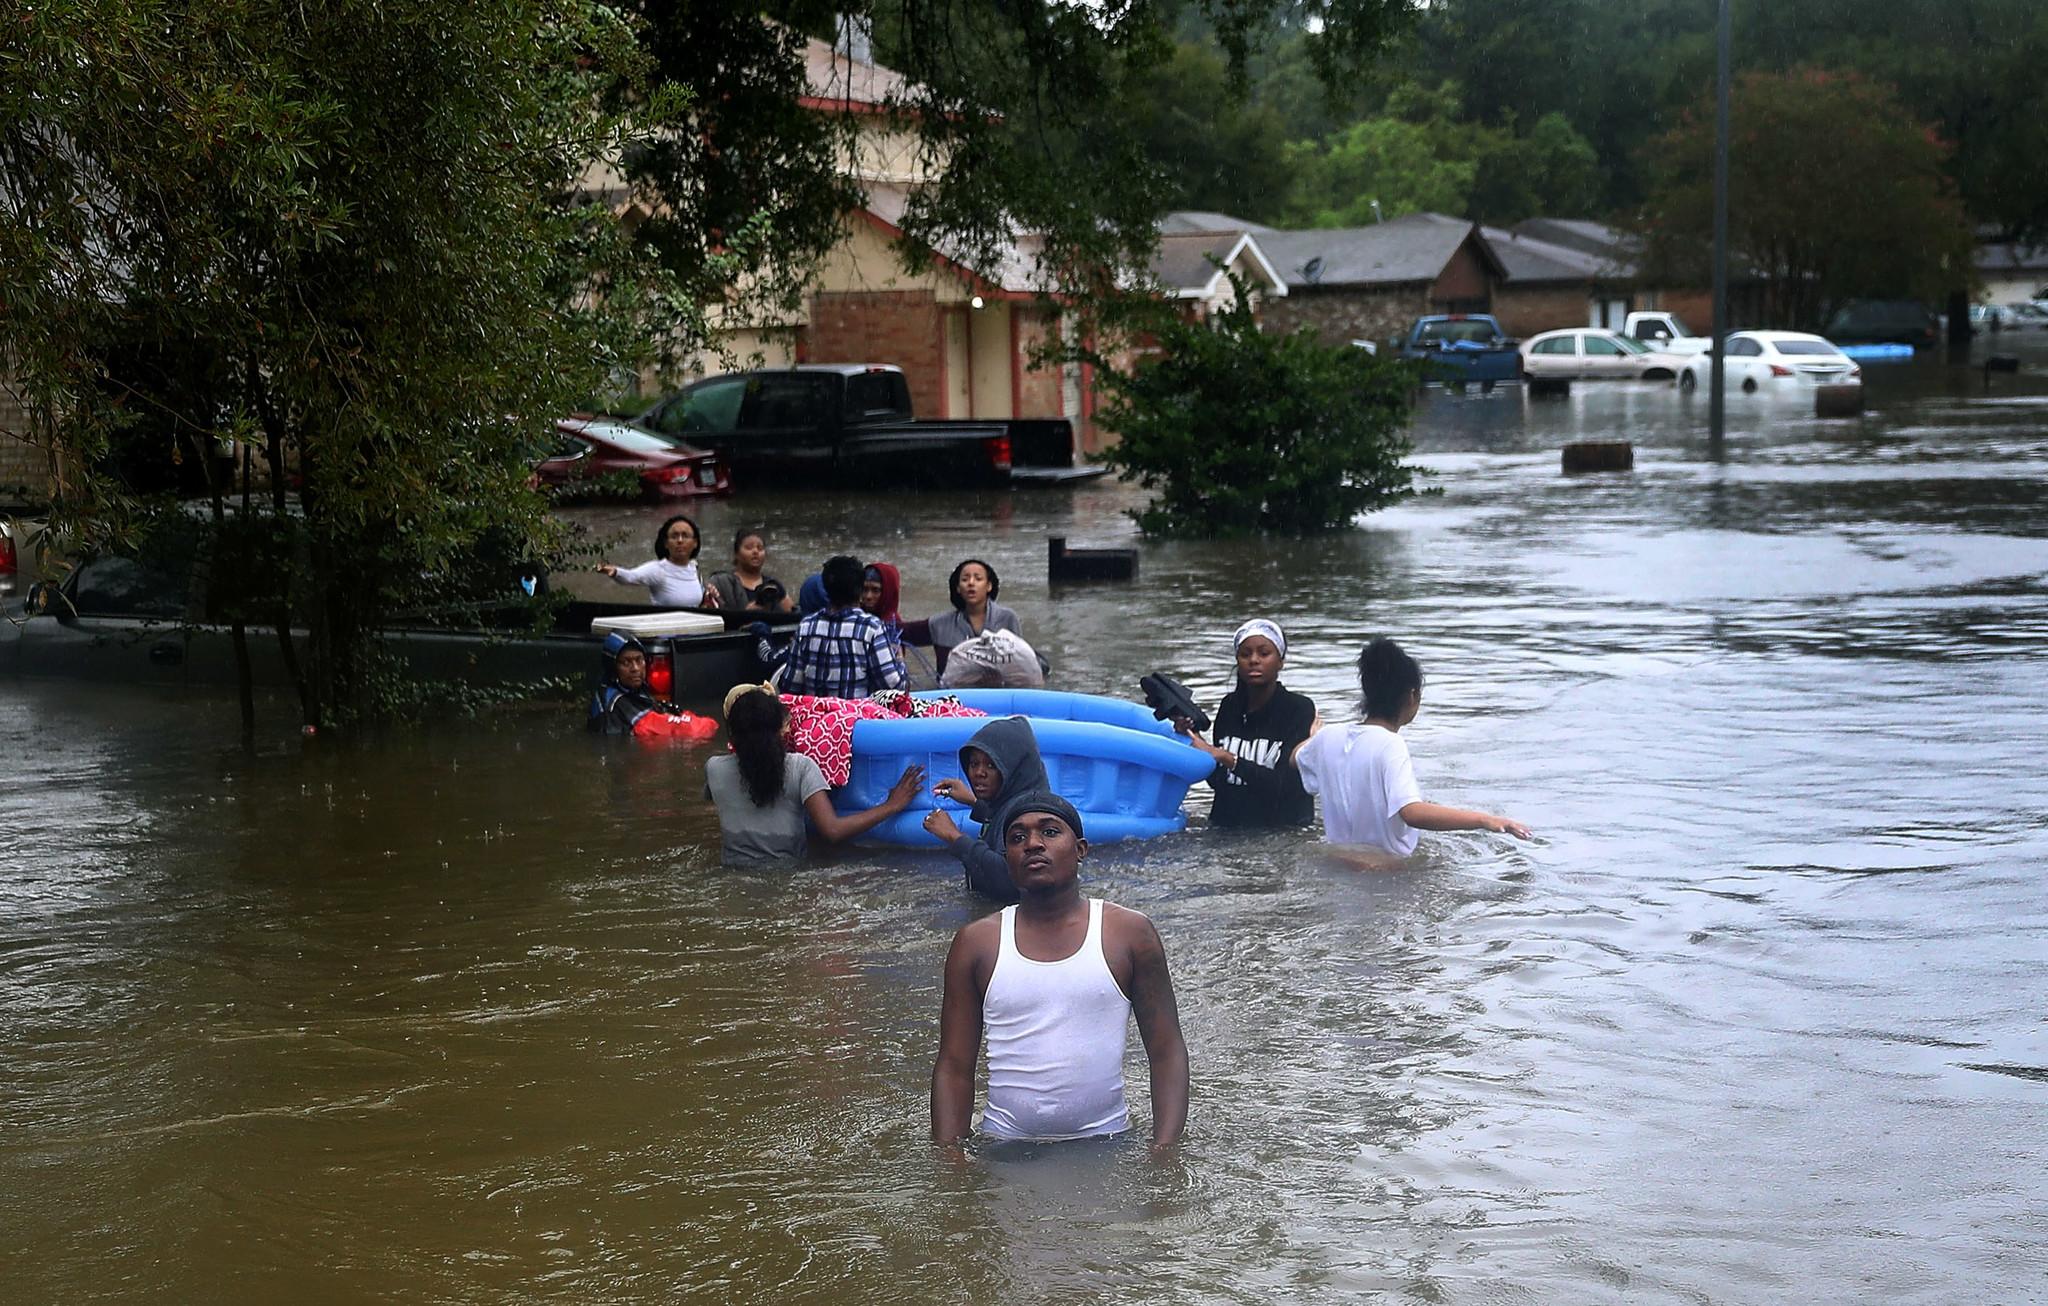 la-na-hurricane-harvey-pictures-20170825-132